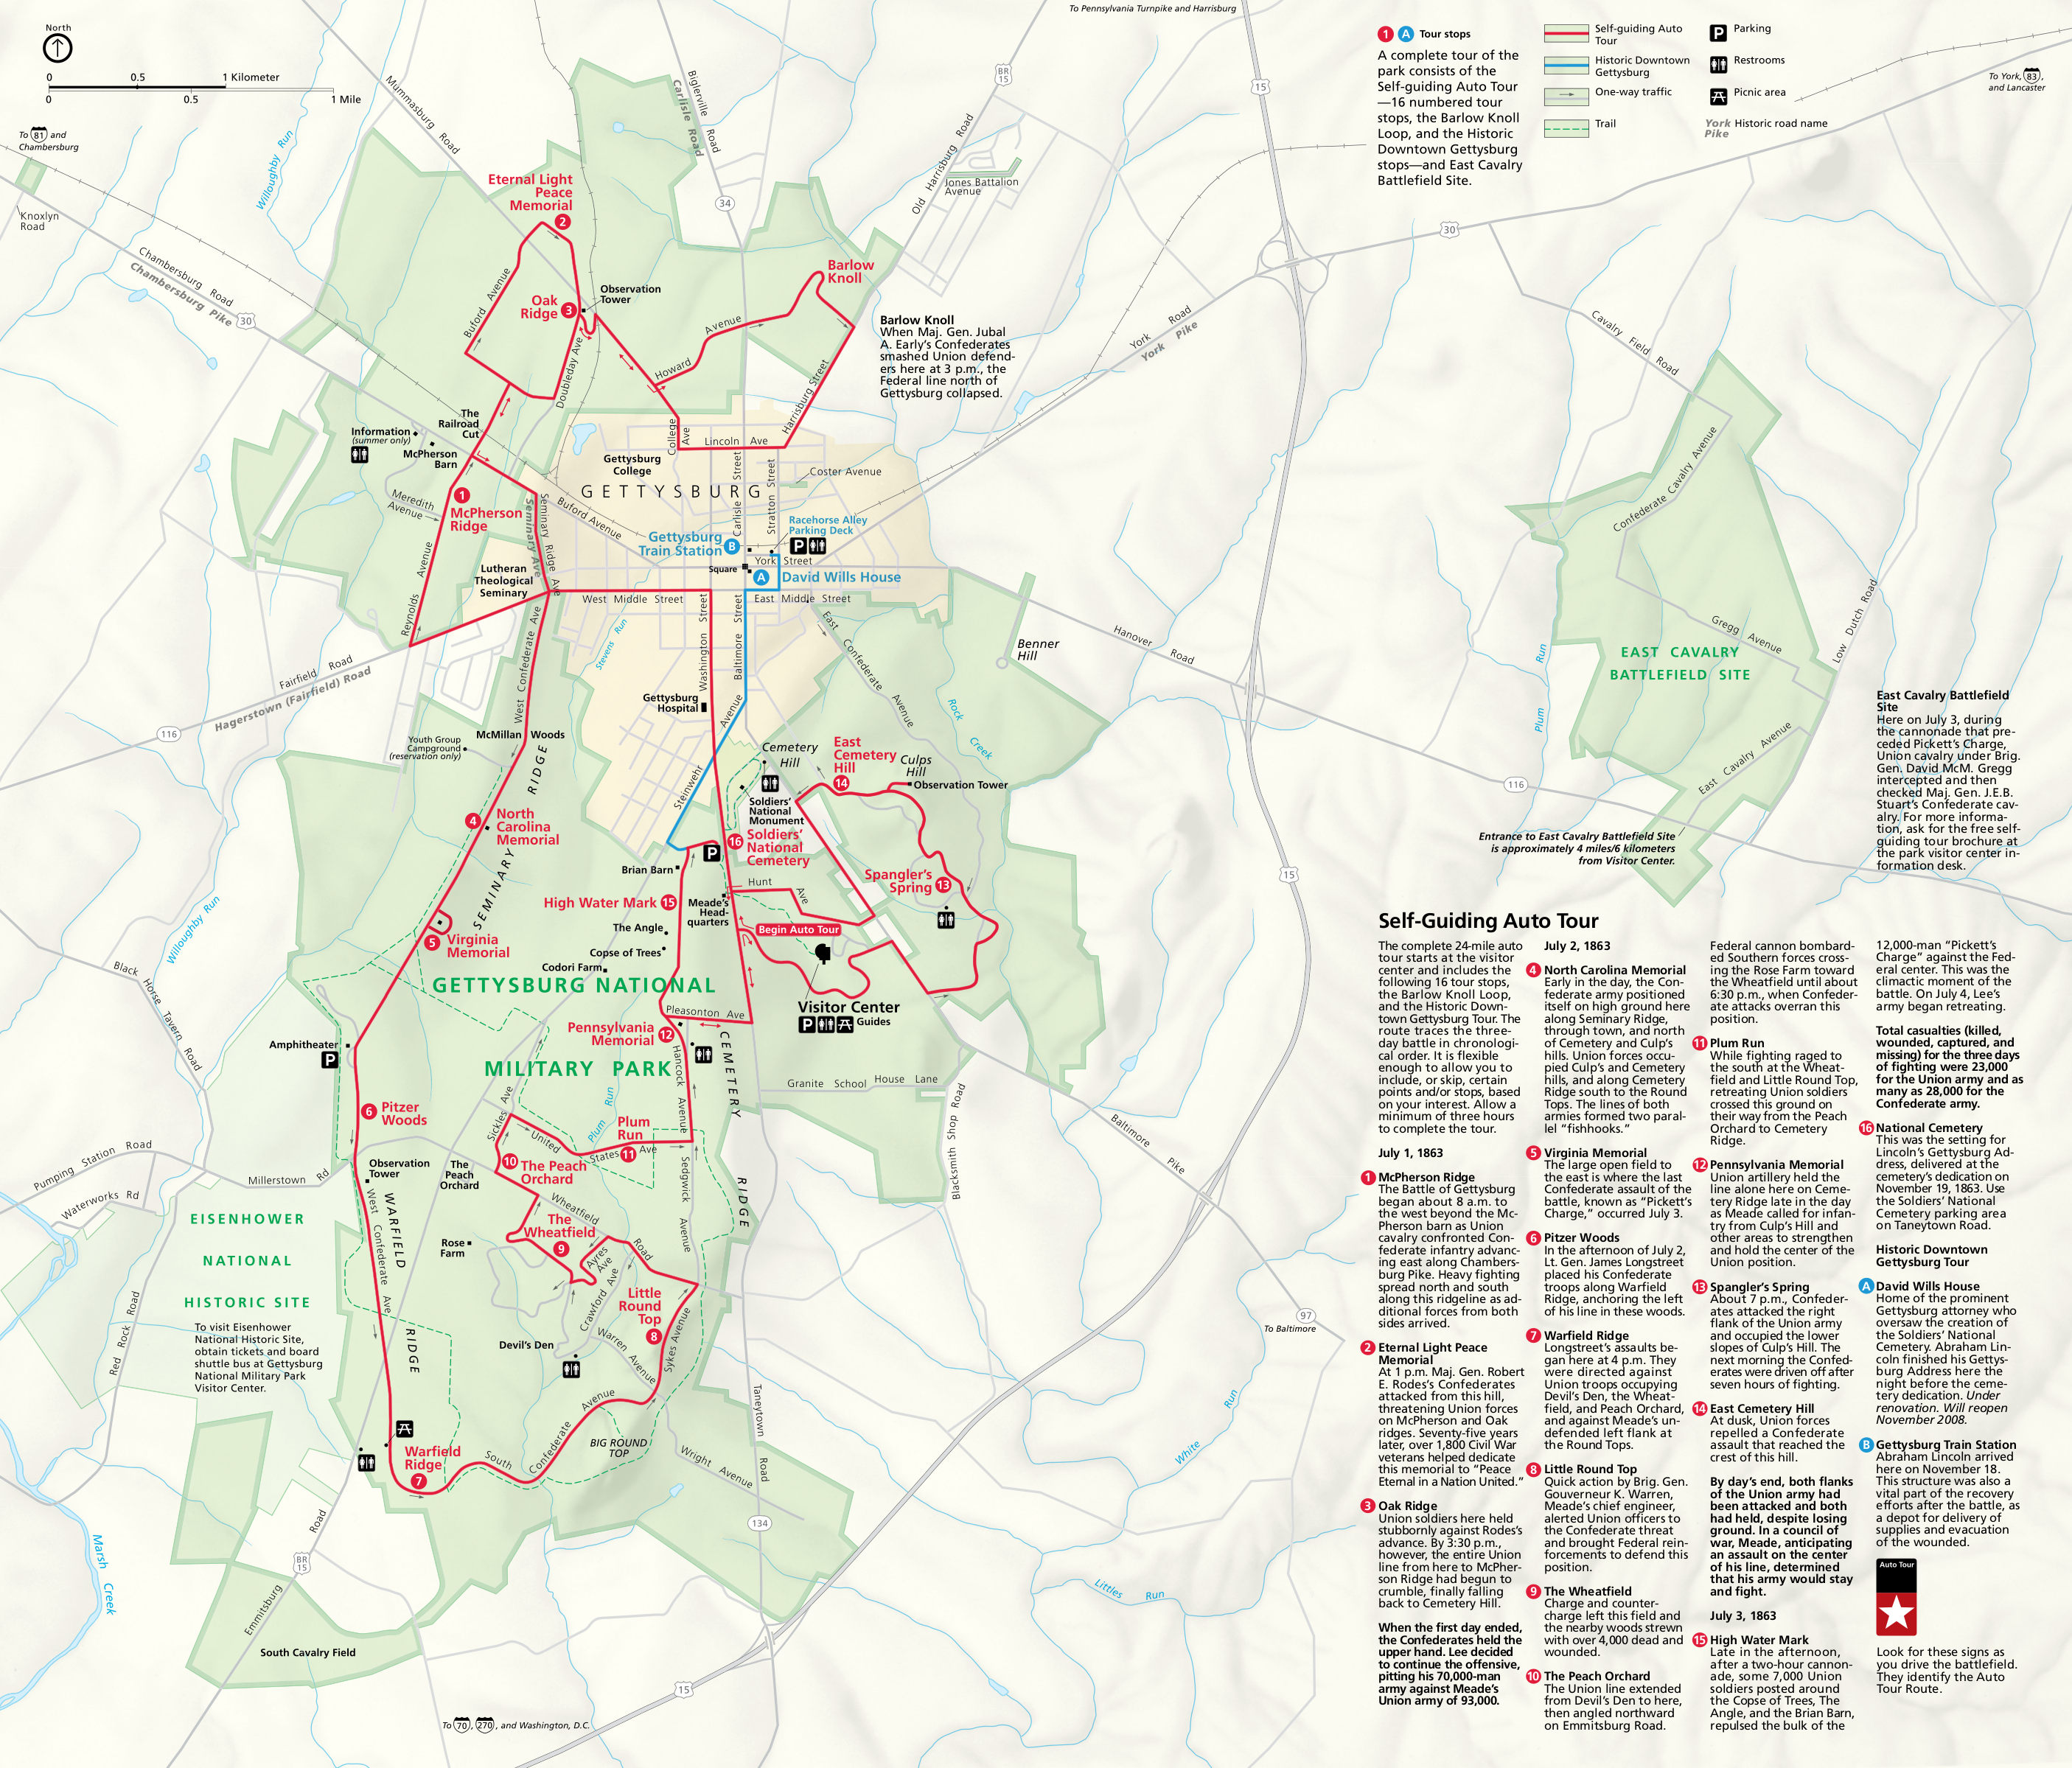 Map Of Gettysburg Gettysburg Maps | NPMaps.  just free maps, period.